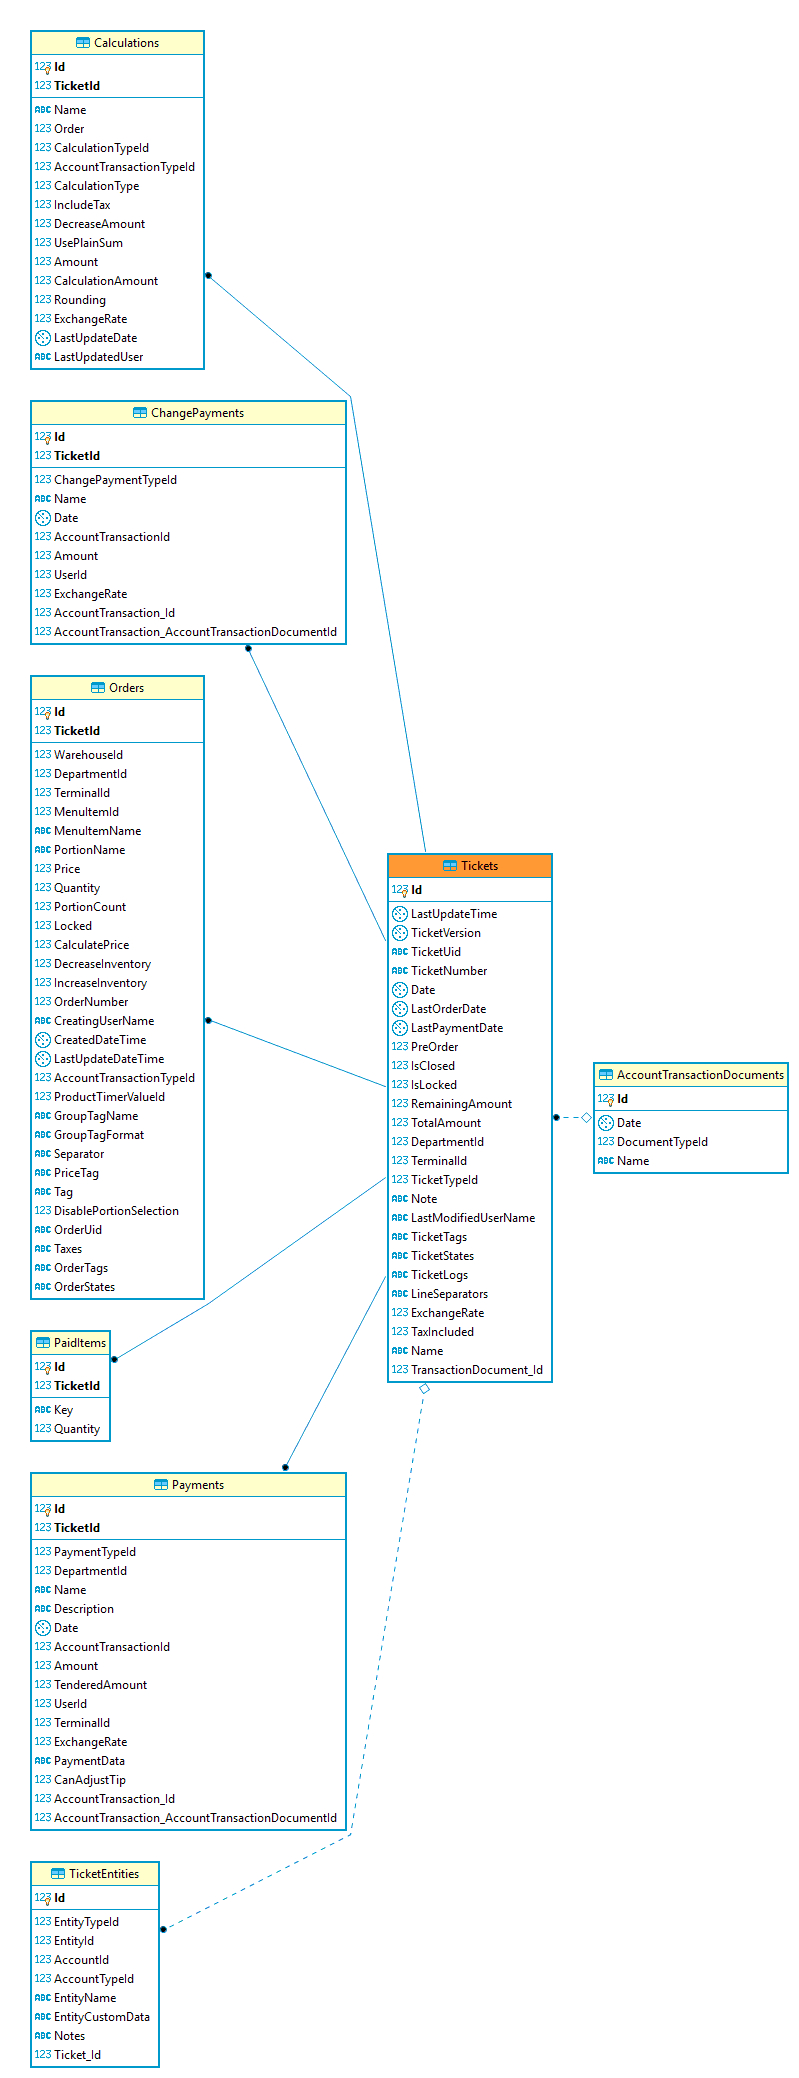 Database Design - What Do The Entity-Relationship Diagram regarding Entity Relationship Symbols